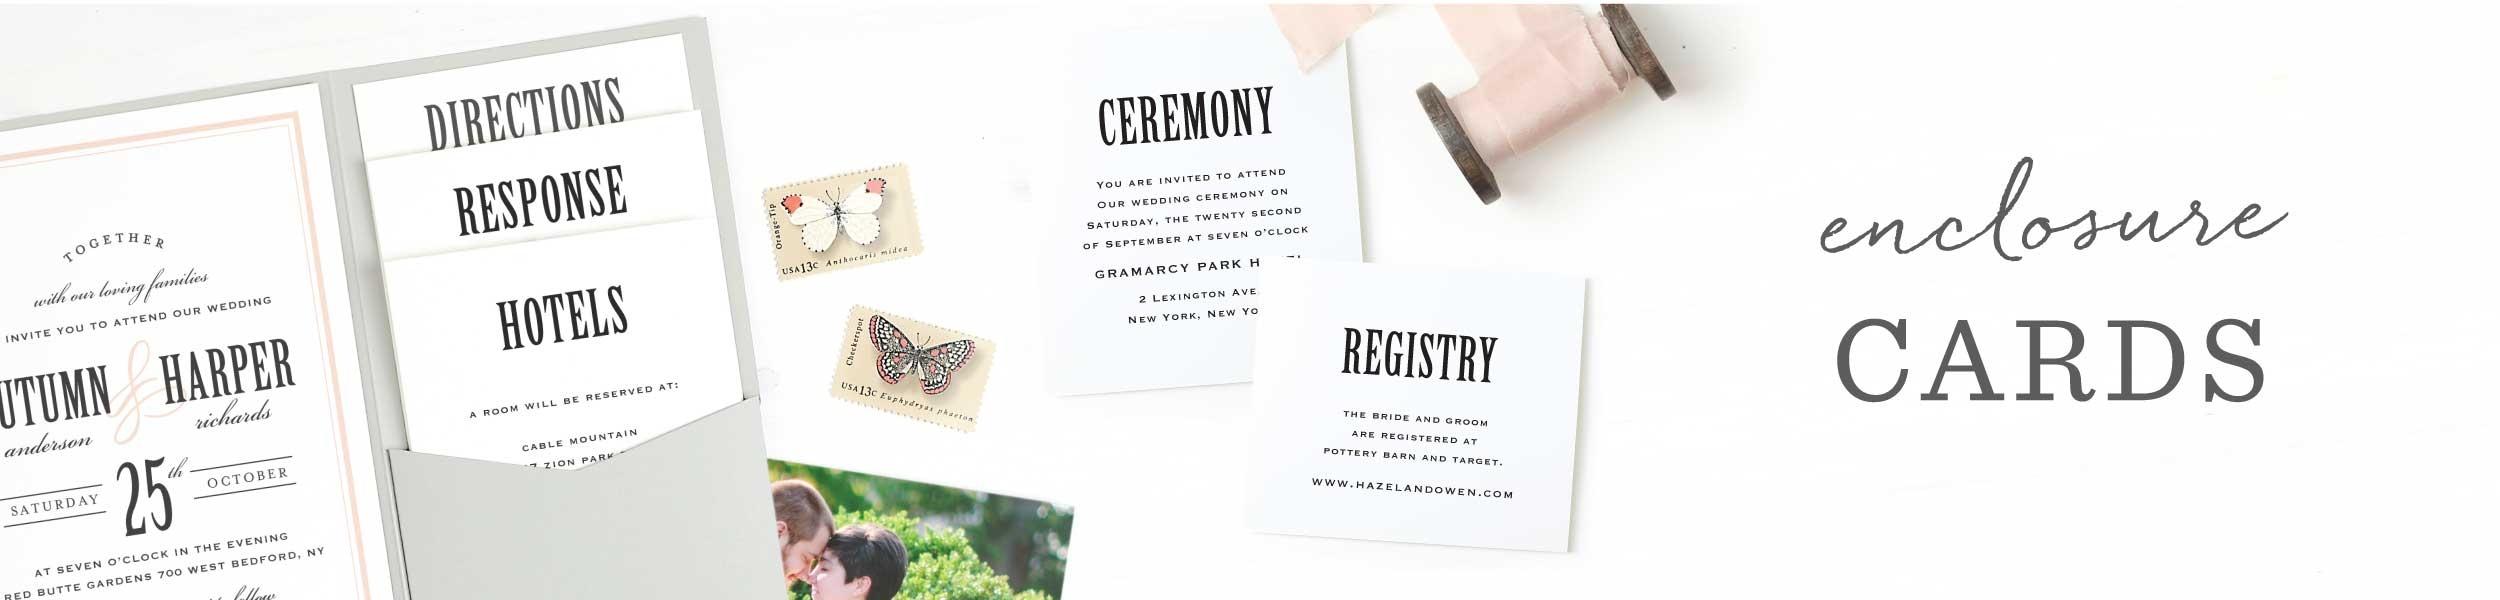 Customizable Wedding Registry Cards -Basic Invite - Free Printable Registry Cards